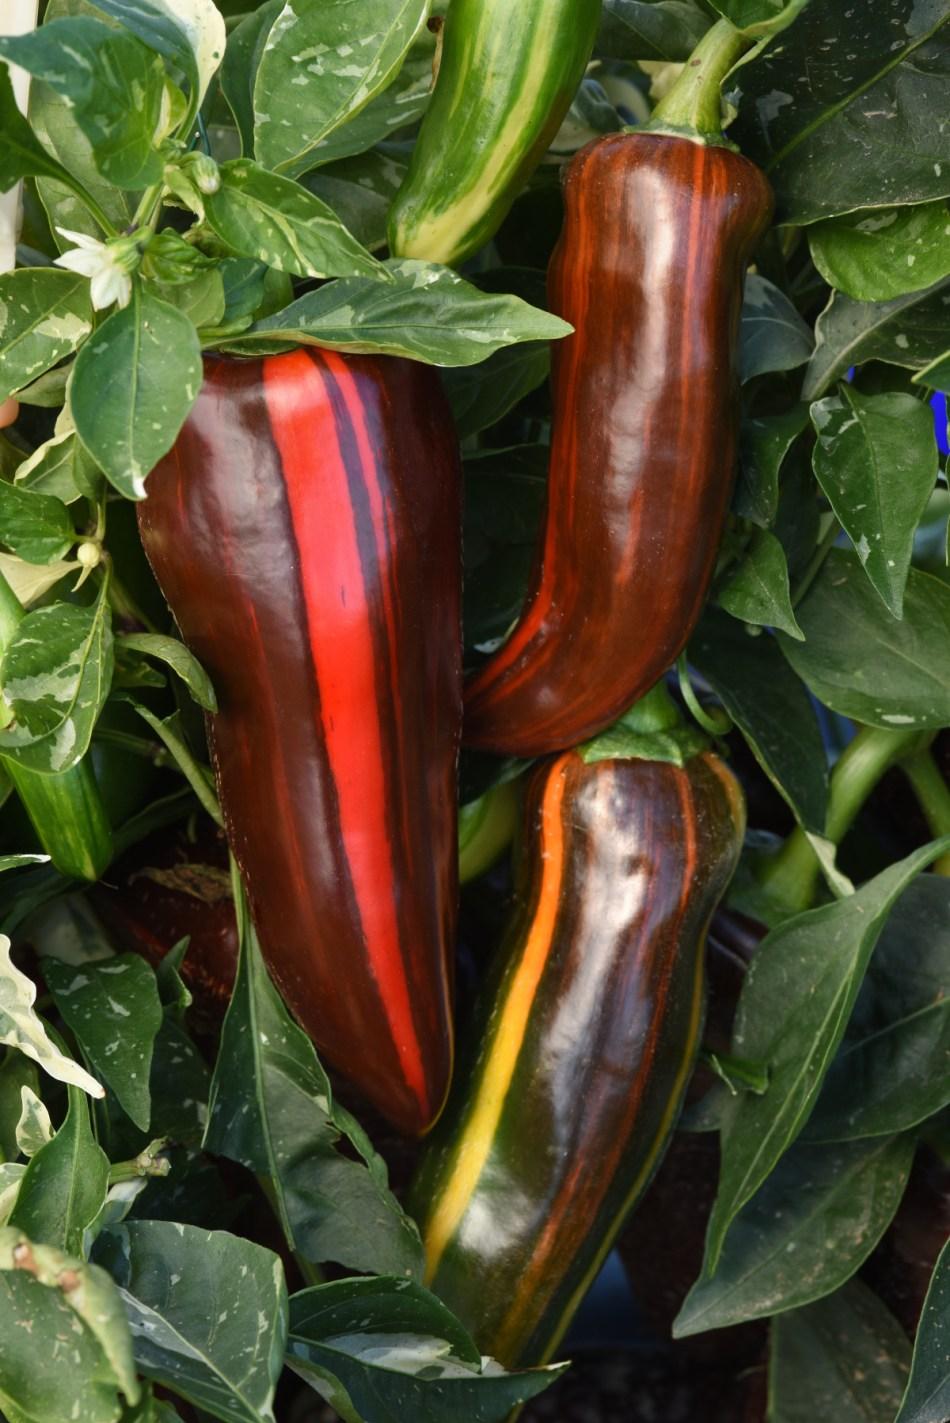 Mocha Swirl peppers at maturity.